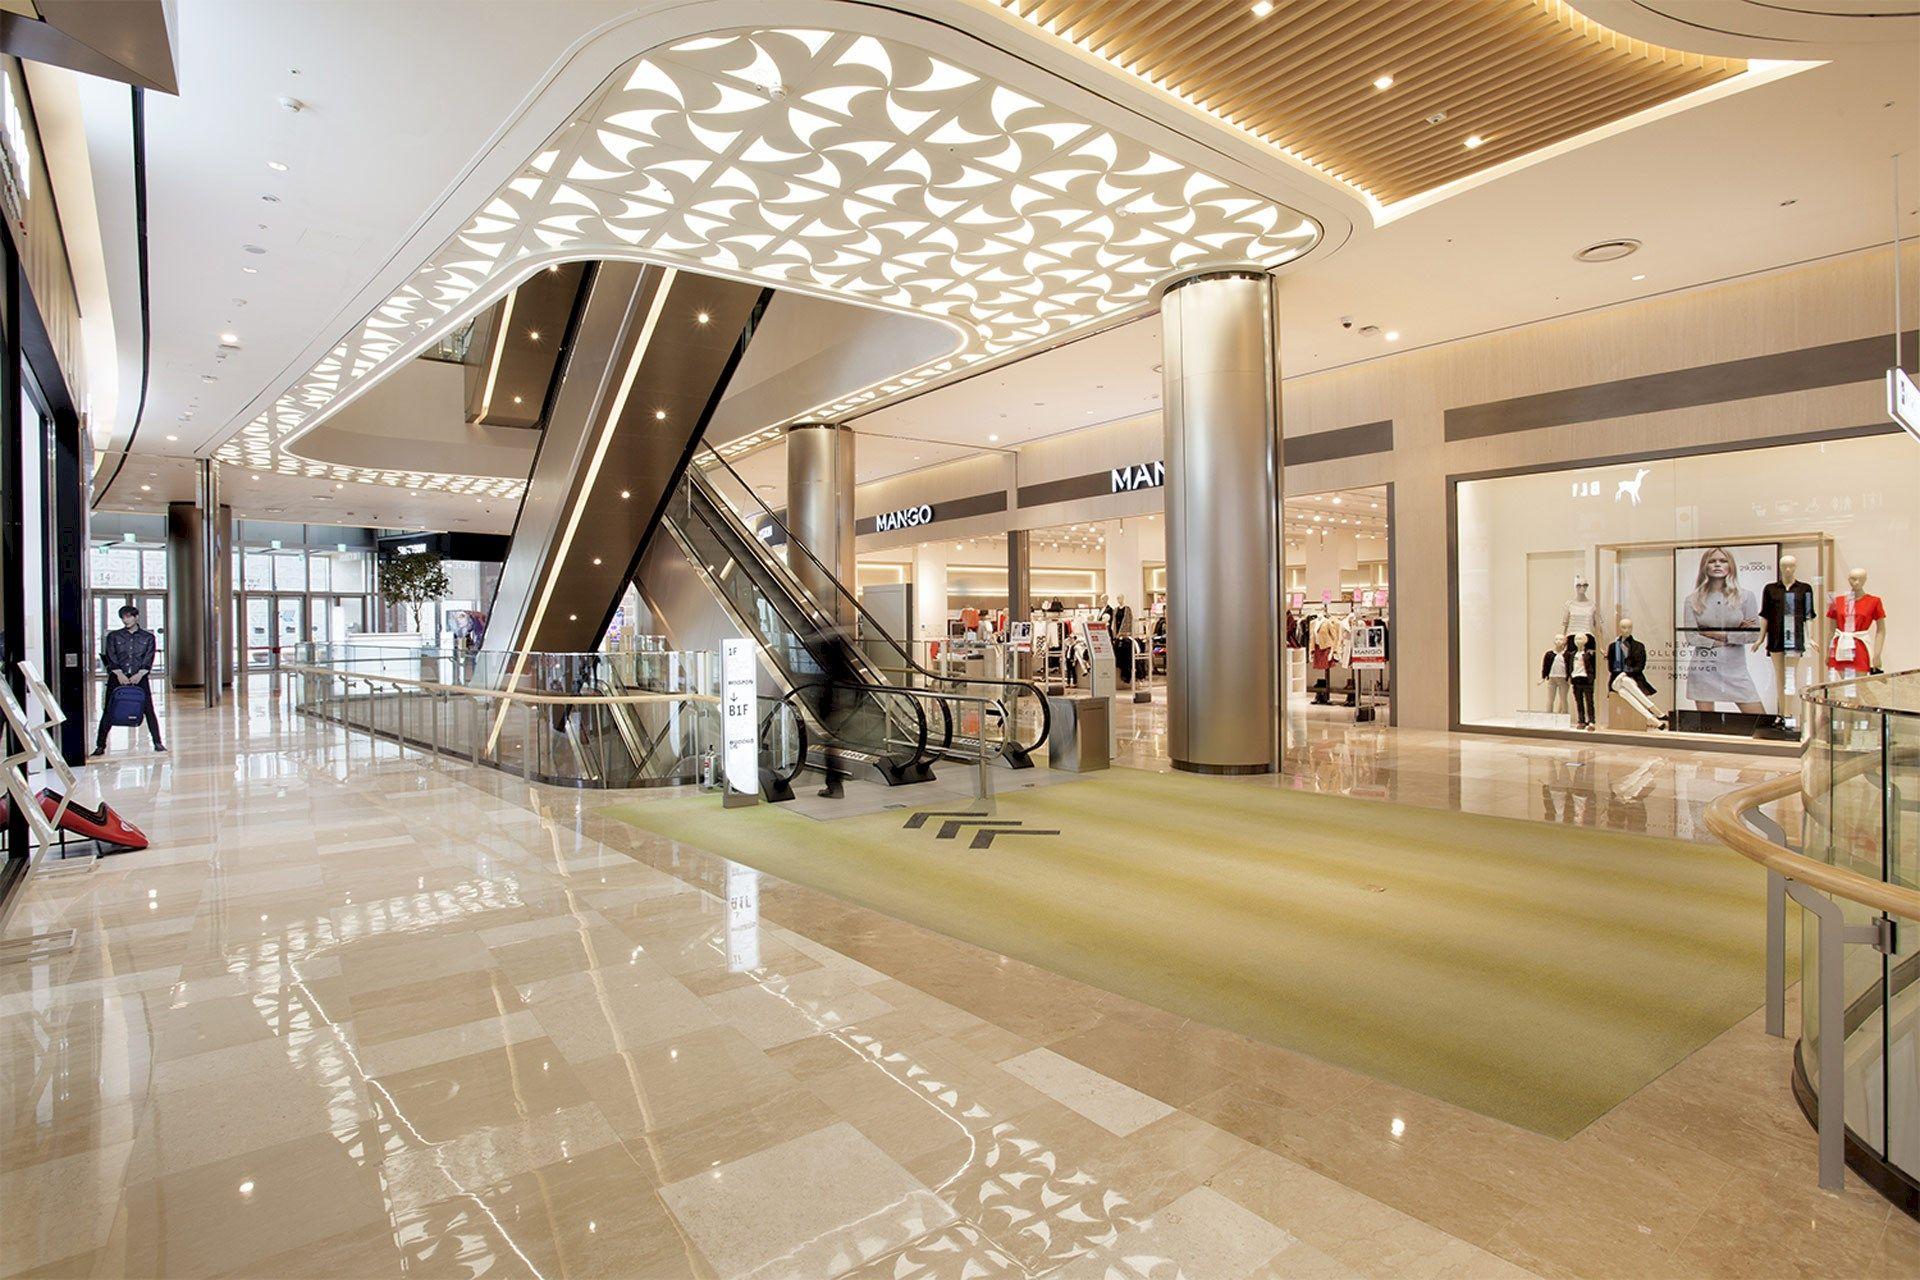 Lotte world mall seoul denice hough transarea for Retail interior design